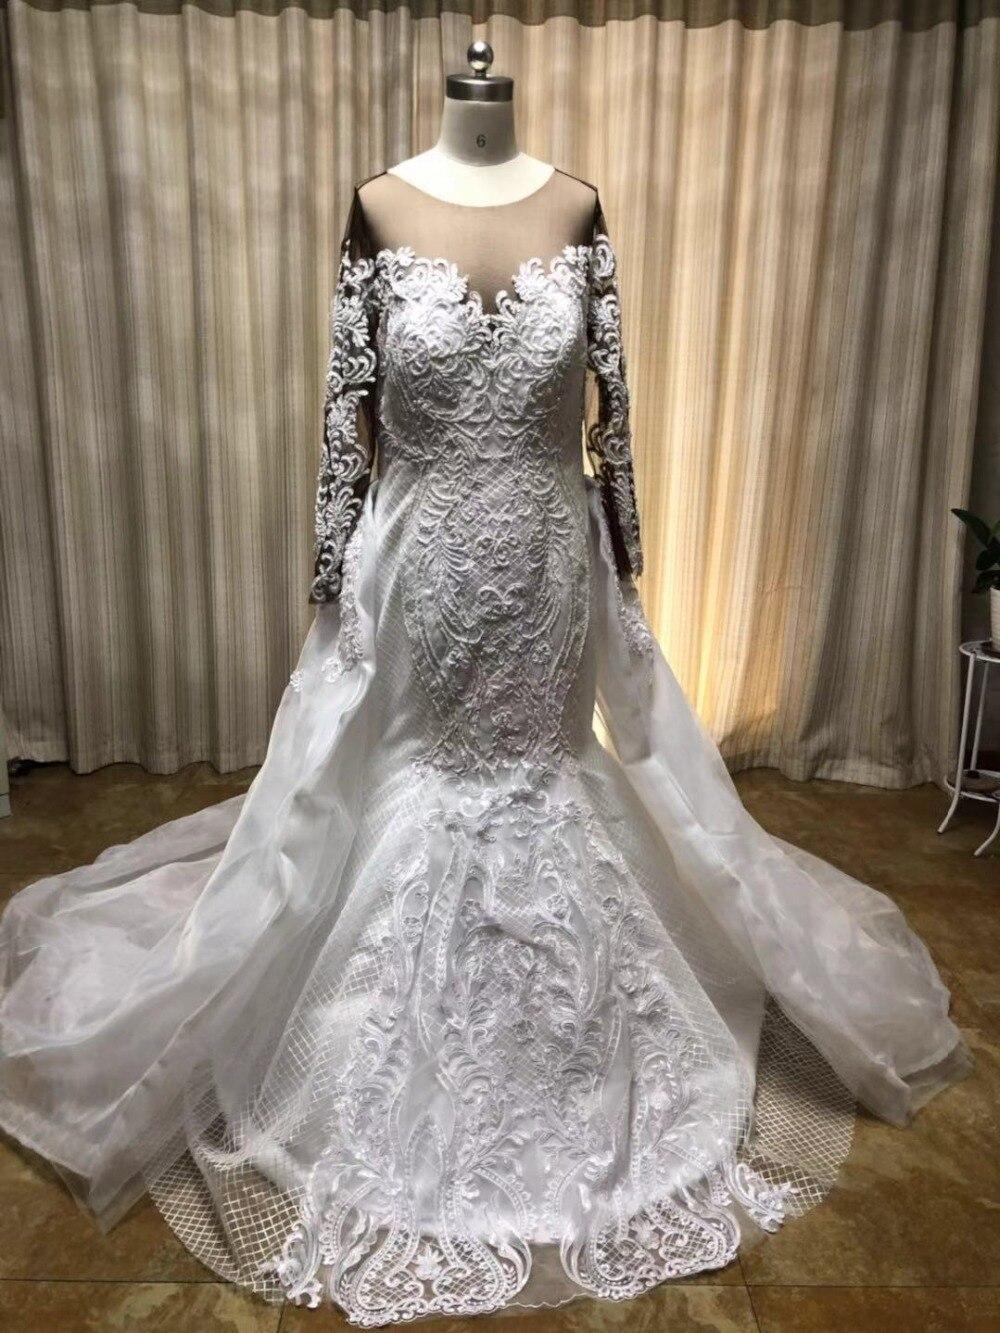 2019 Lace Long Sleeve African Wedding dresses Two piece Casual plus size  Detachable Train Robe de marie